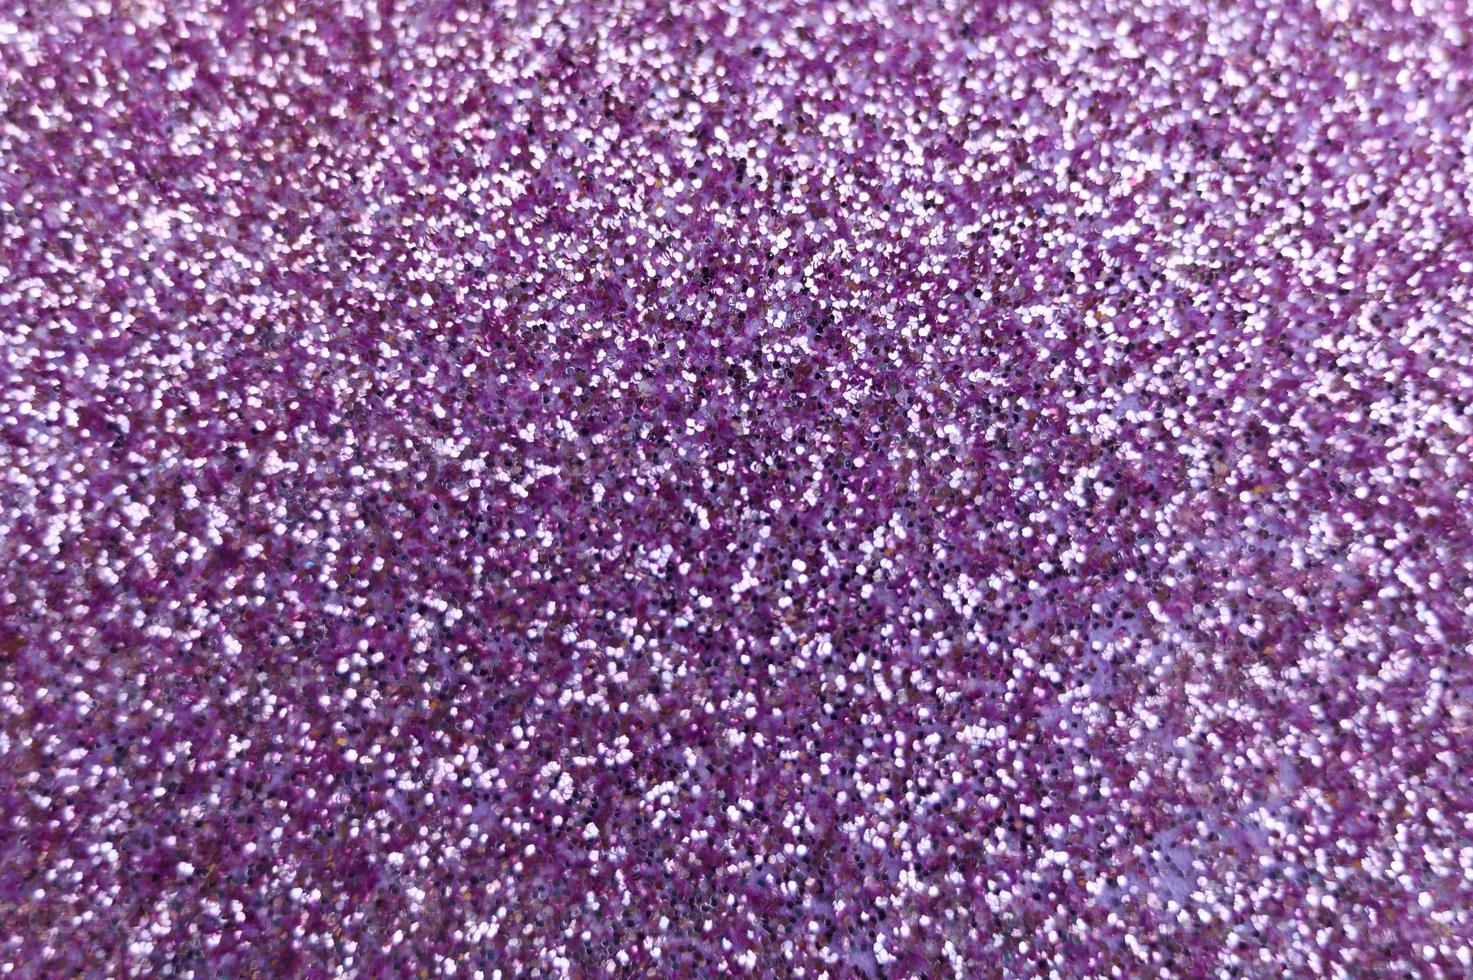 Purple glitter background photo